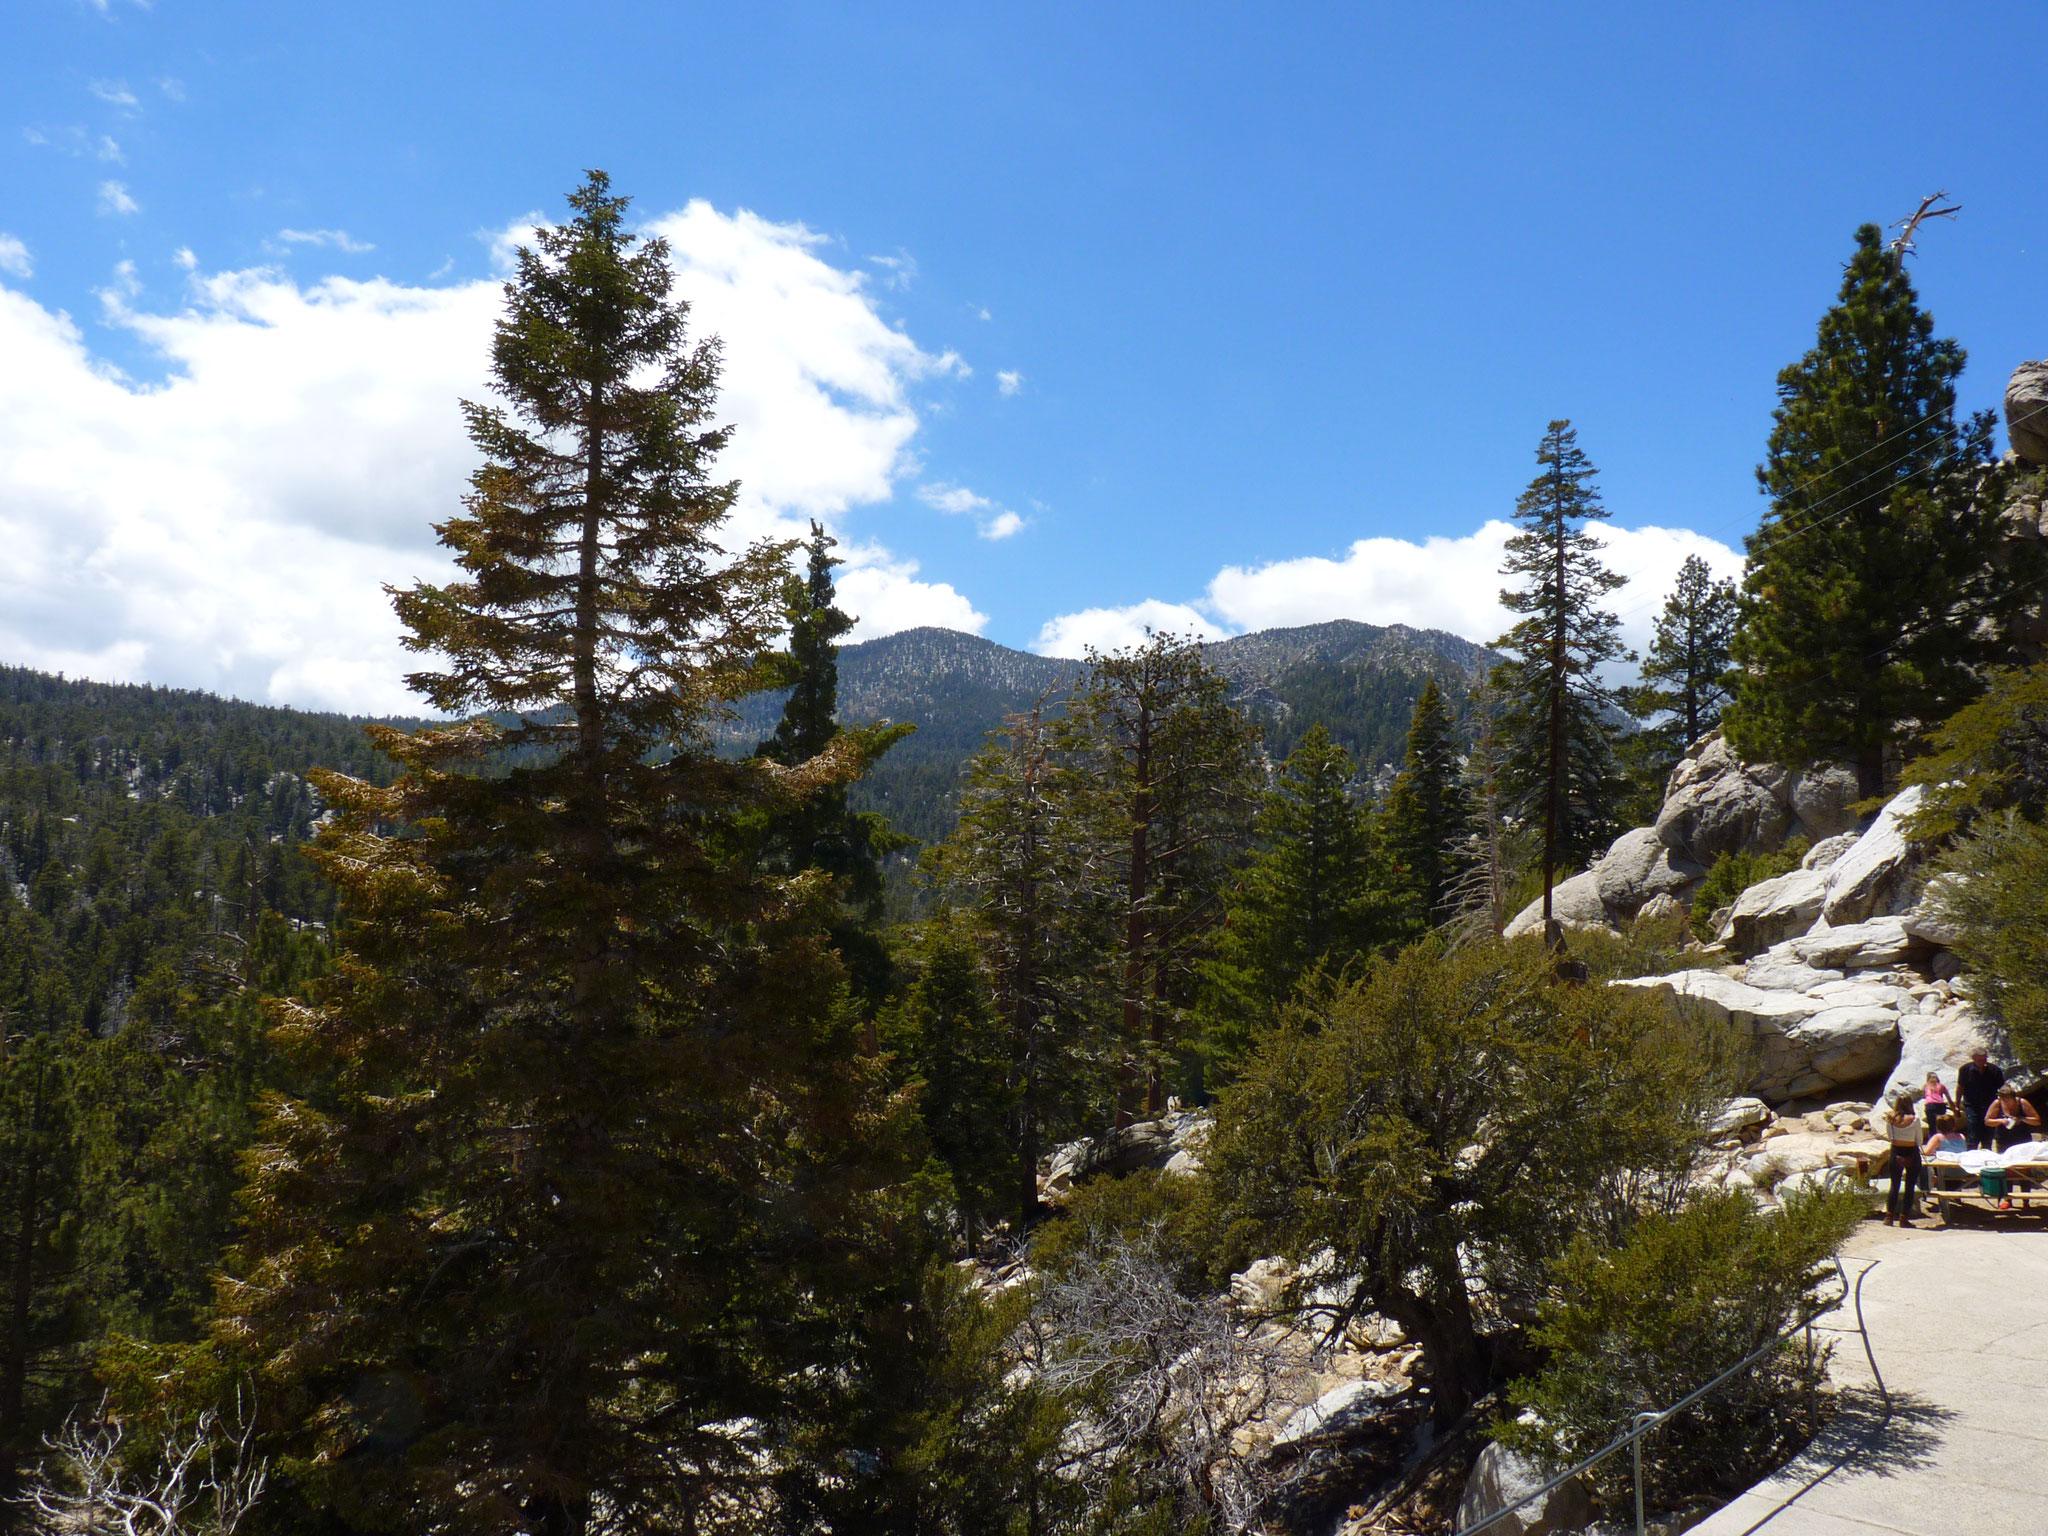 Mont San Jacinto